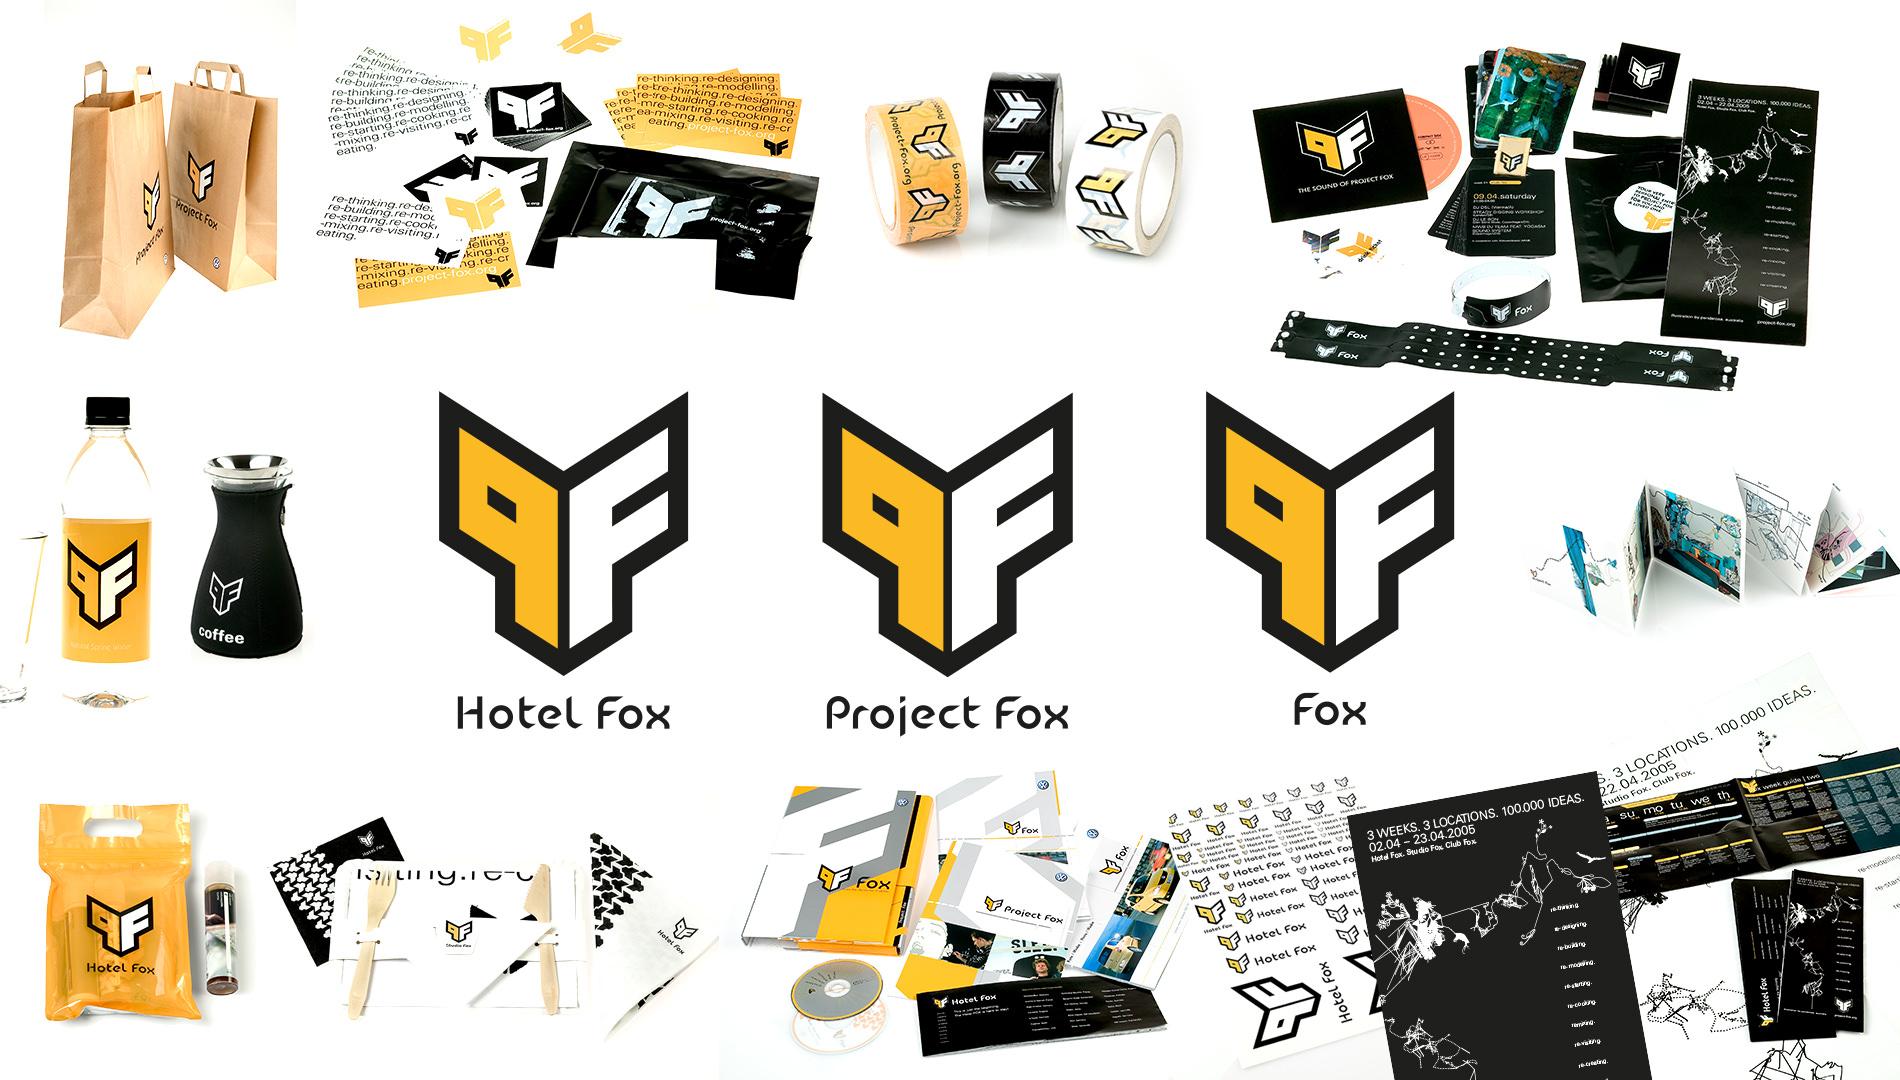 Messe Design Live Kommunikation Kopenhagen VW Projekt Fox Corporate Design Eventtools Going Places EventLabs